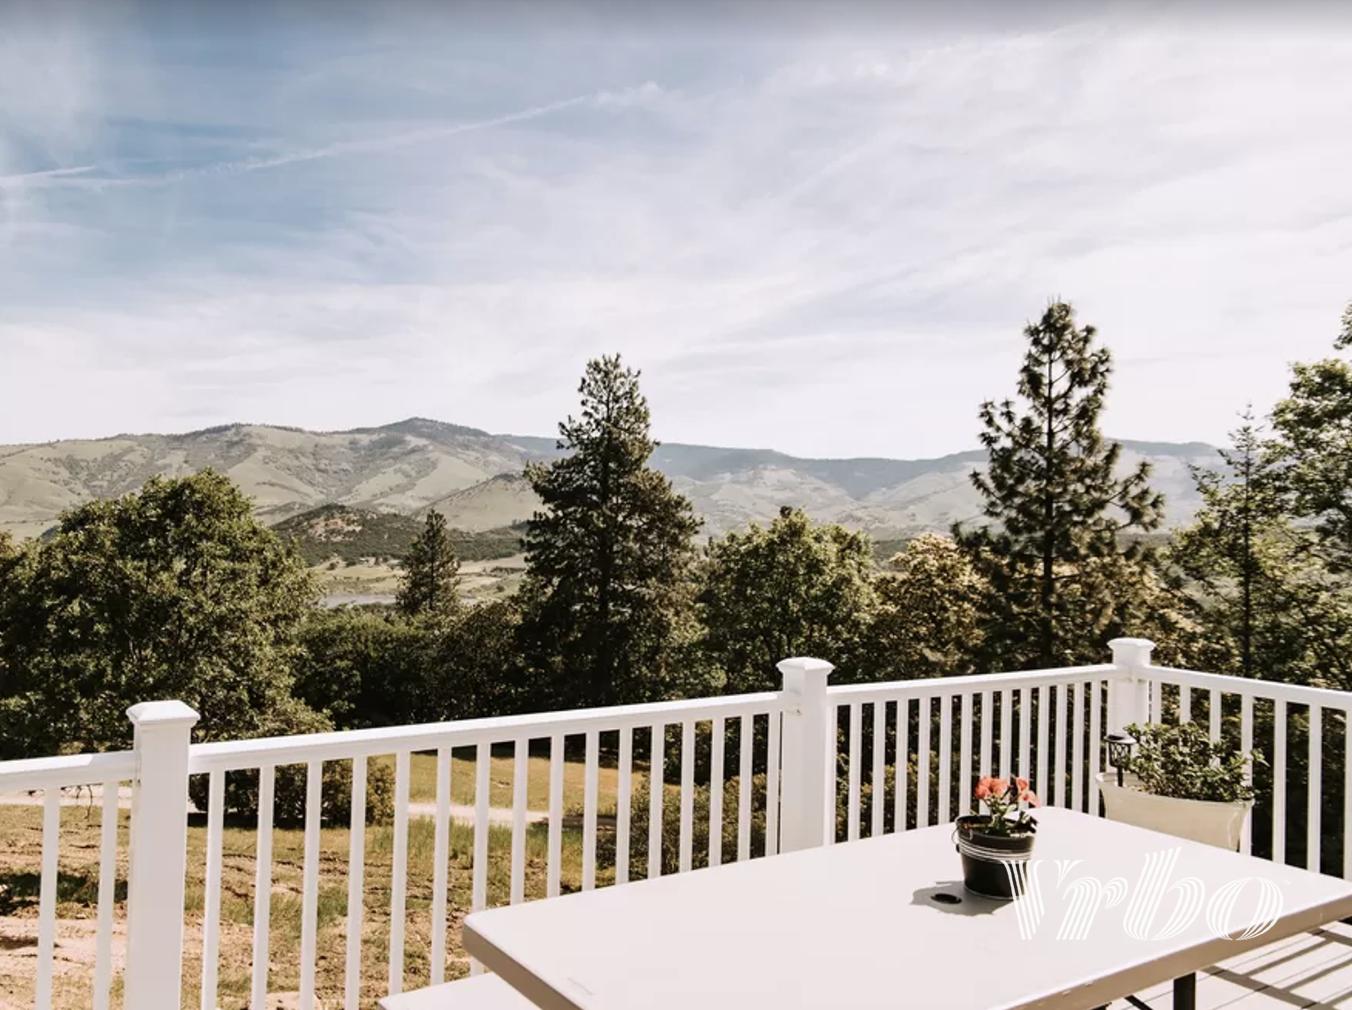 oregon-mountain-views-from-balcony